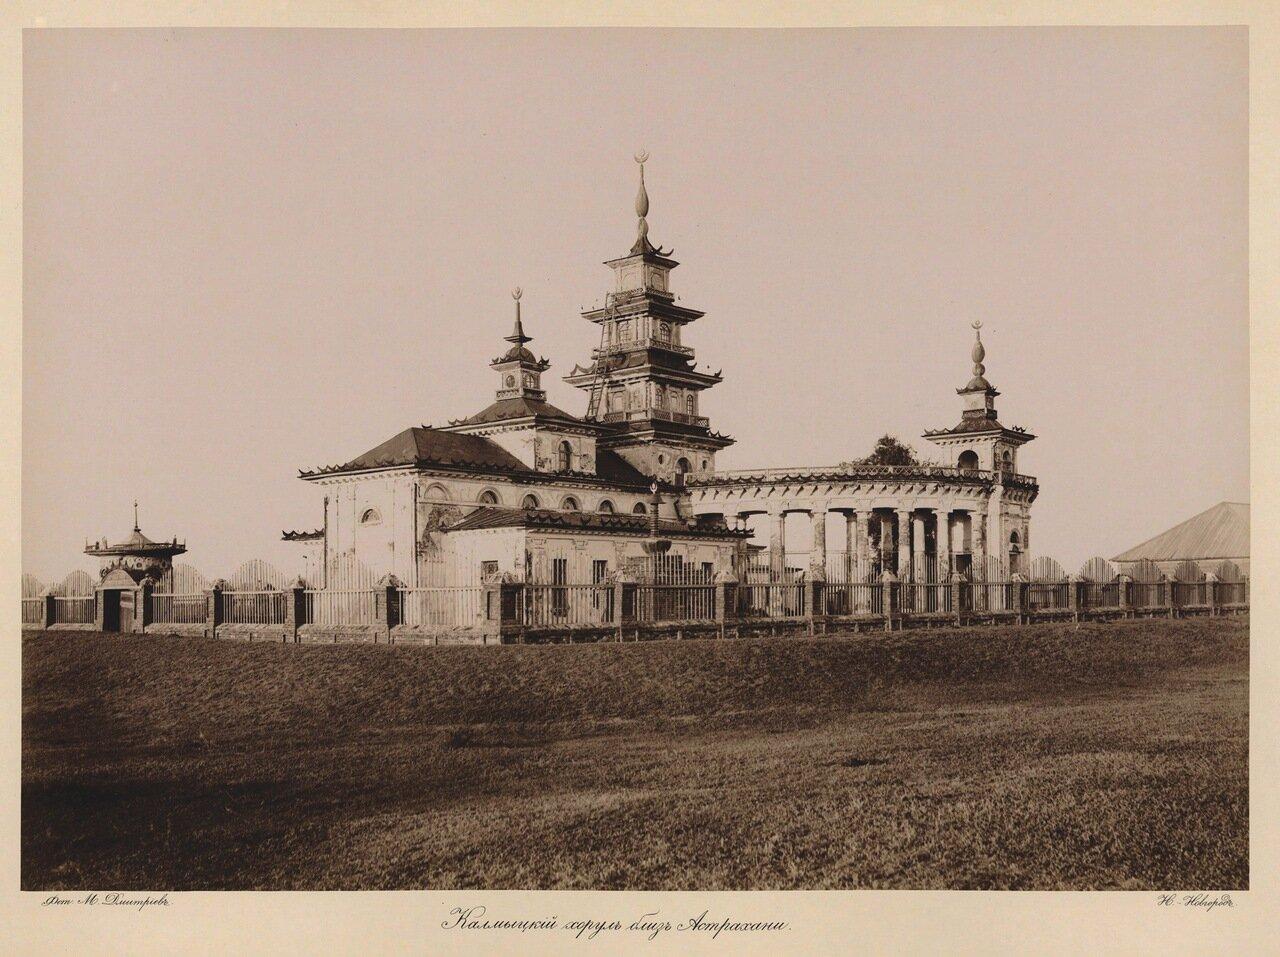 Калмыцкий хорул близ Астрахани. 1890.